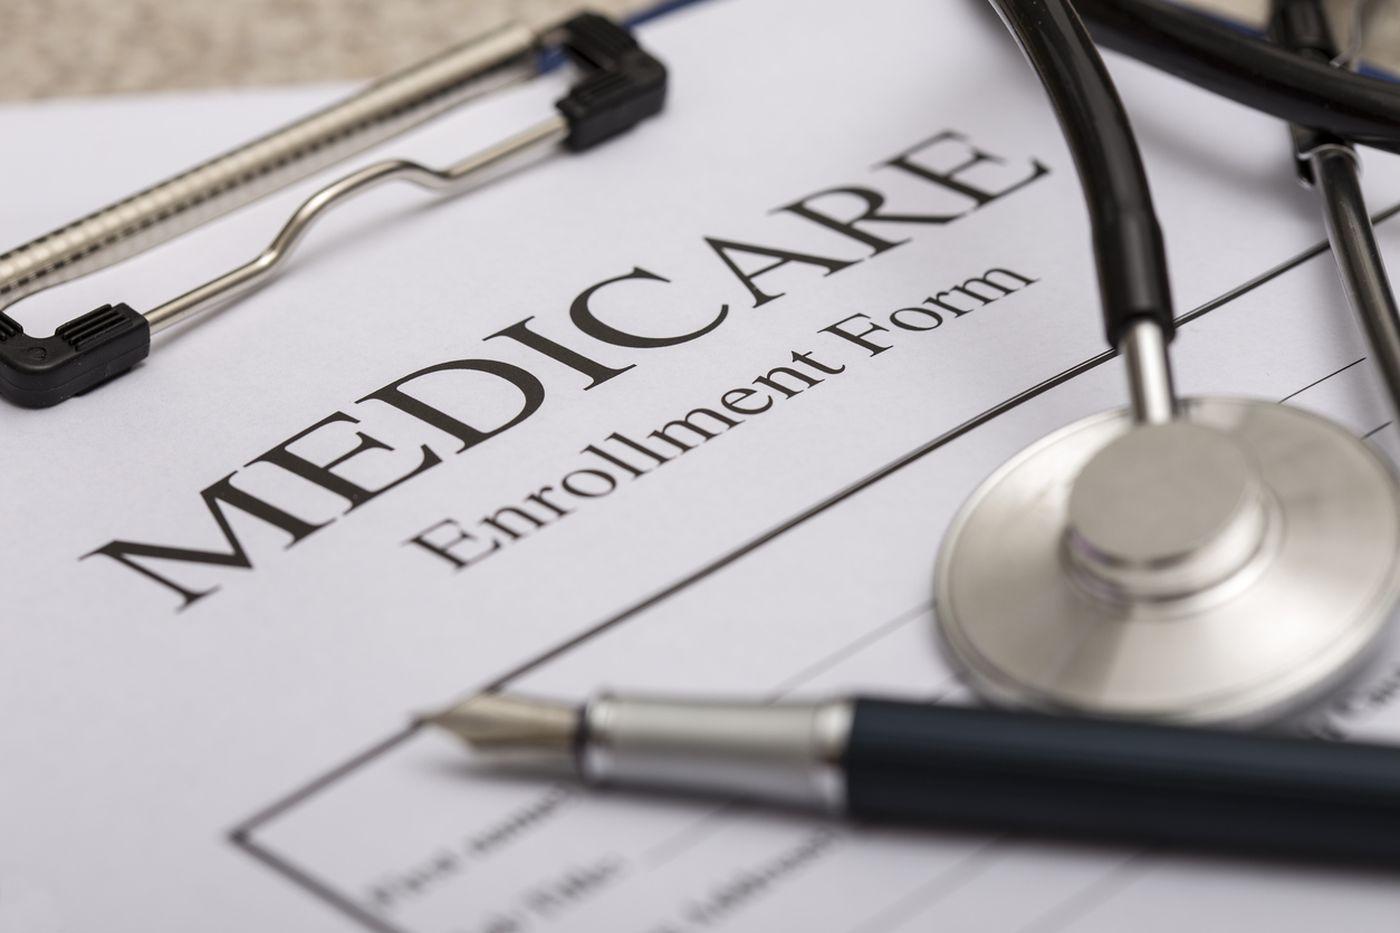 Send us your questions about Medicare open enrollment